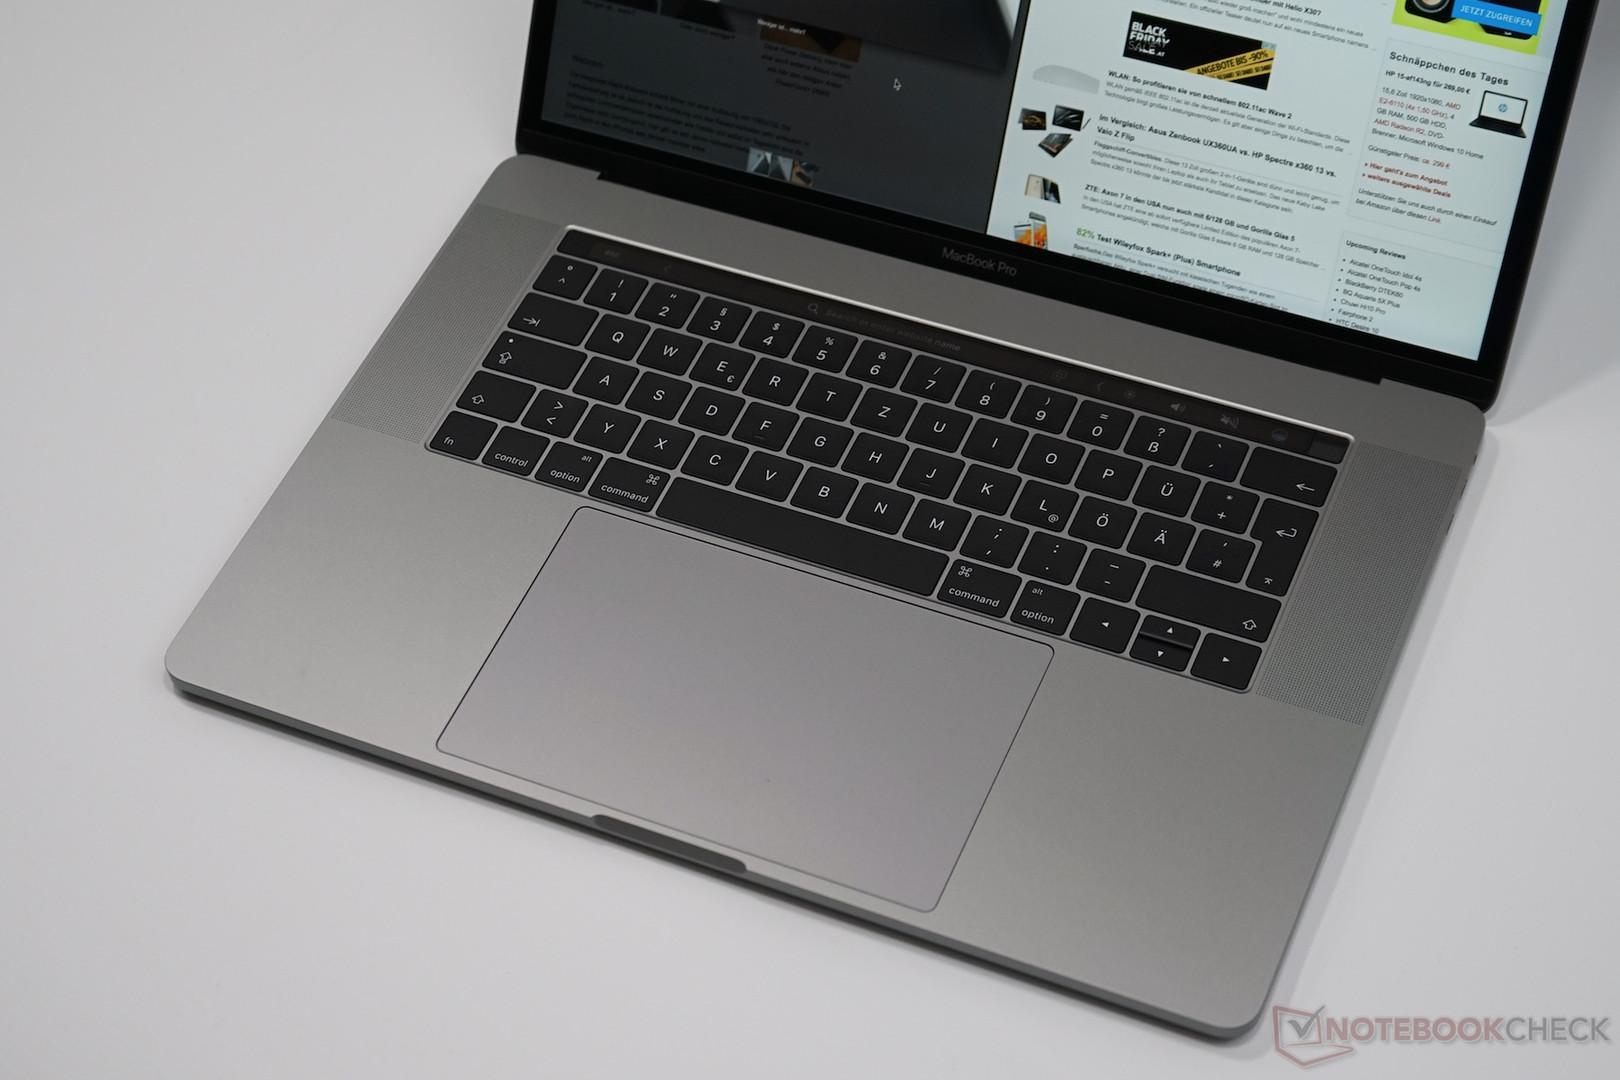 Apple MacBook Pro 15 (2016年末, 2 6 GHz i7) 笔记本电脑简短评测